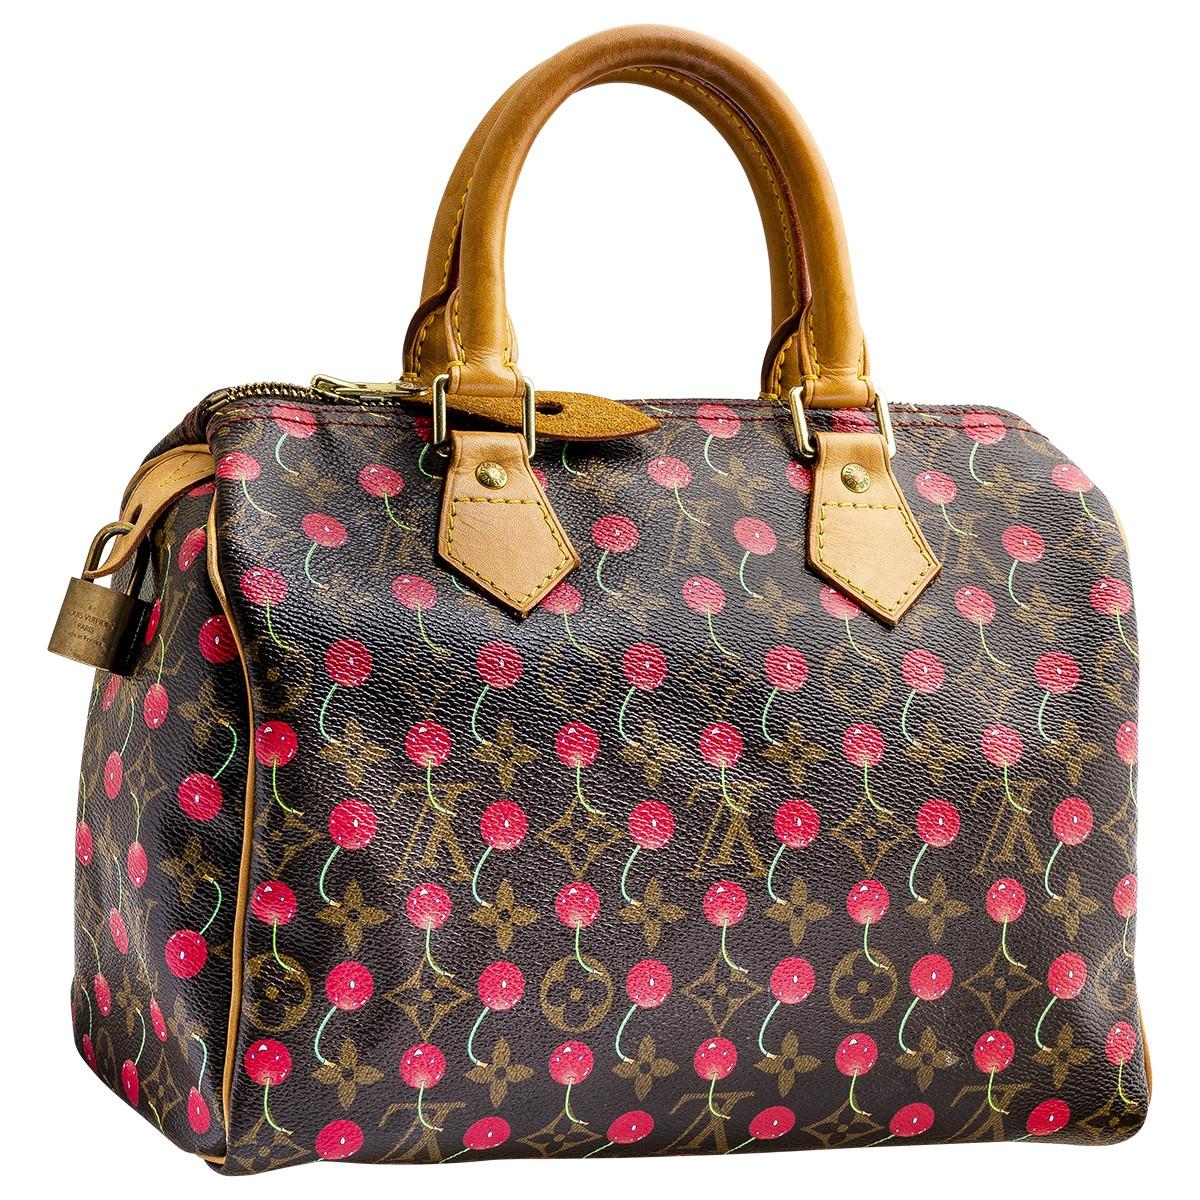 Vintage Louis Vuitton Cherry Speedy Bag